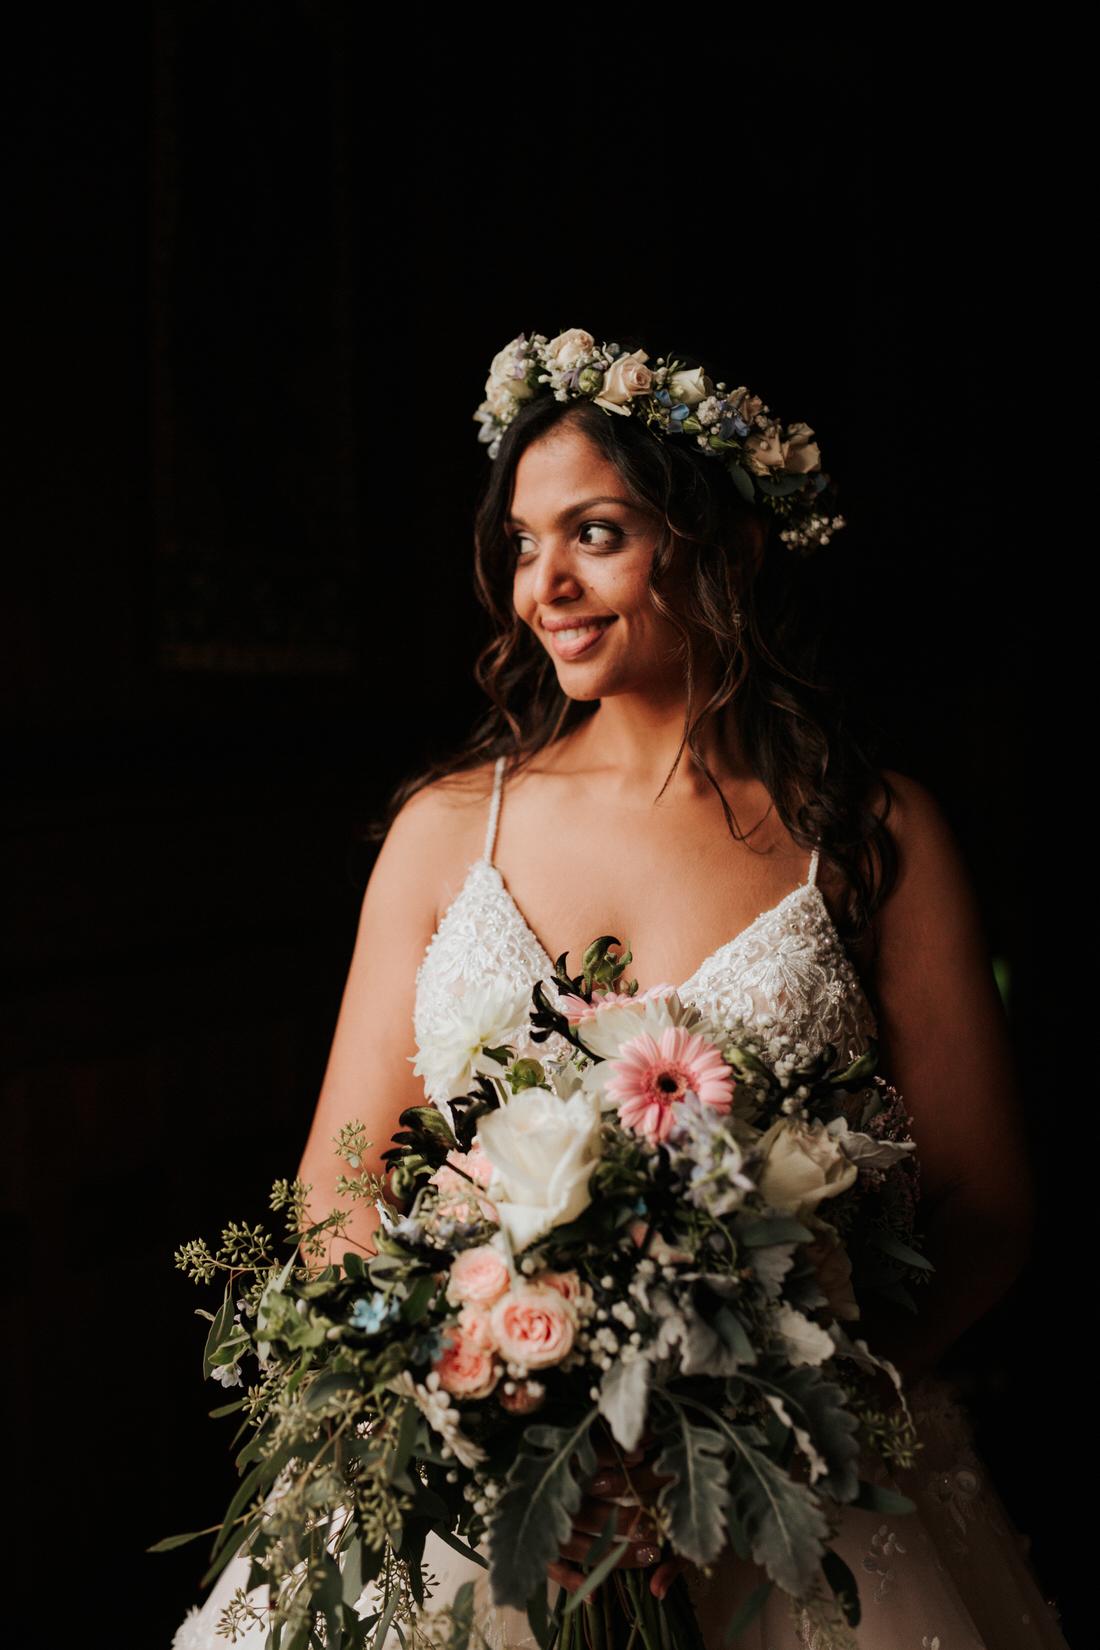 New York Catskills Spillian Wedding - Diana Ascarrunz Photography-133.jpg